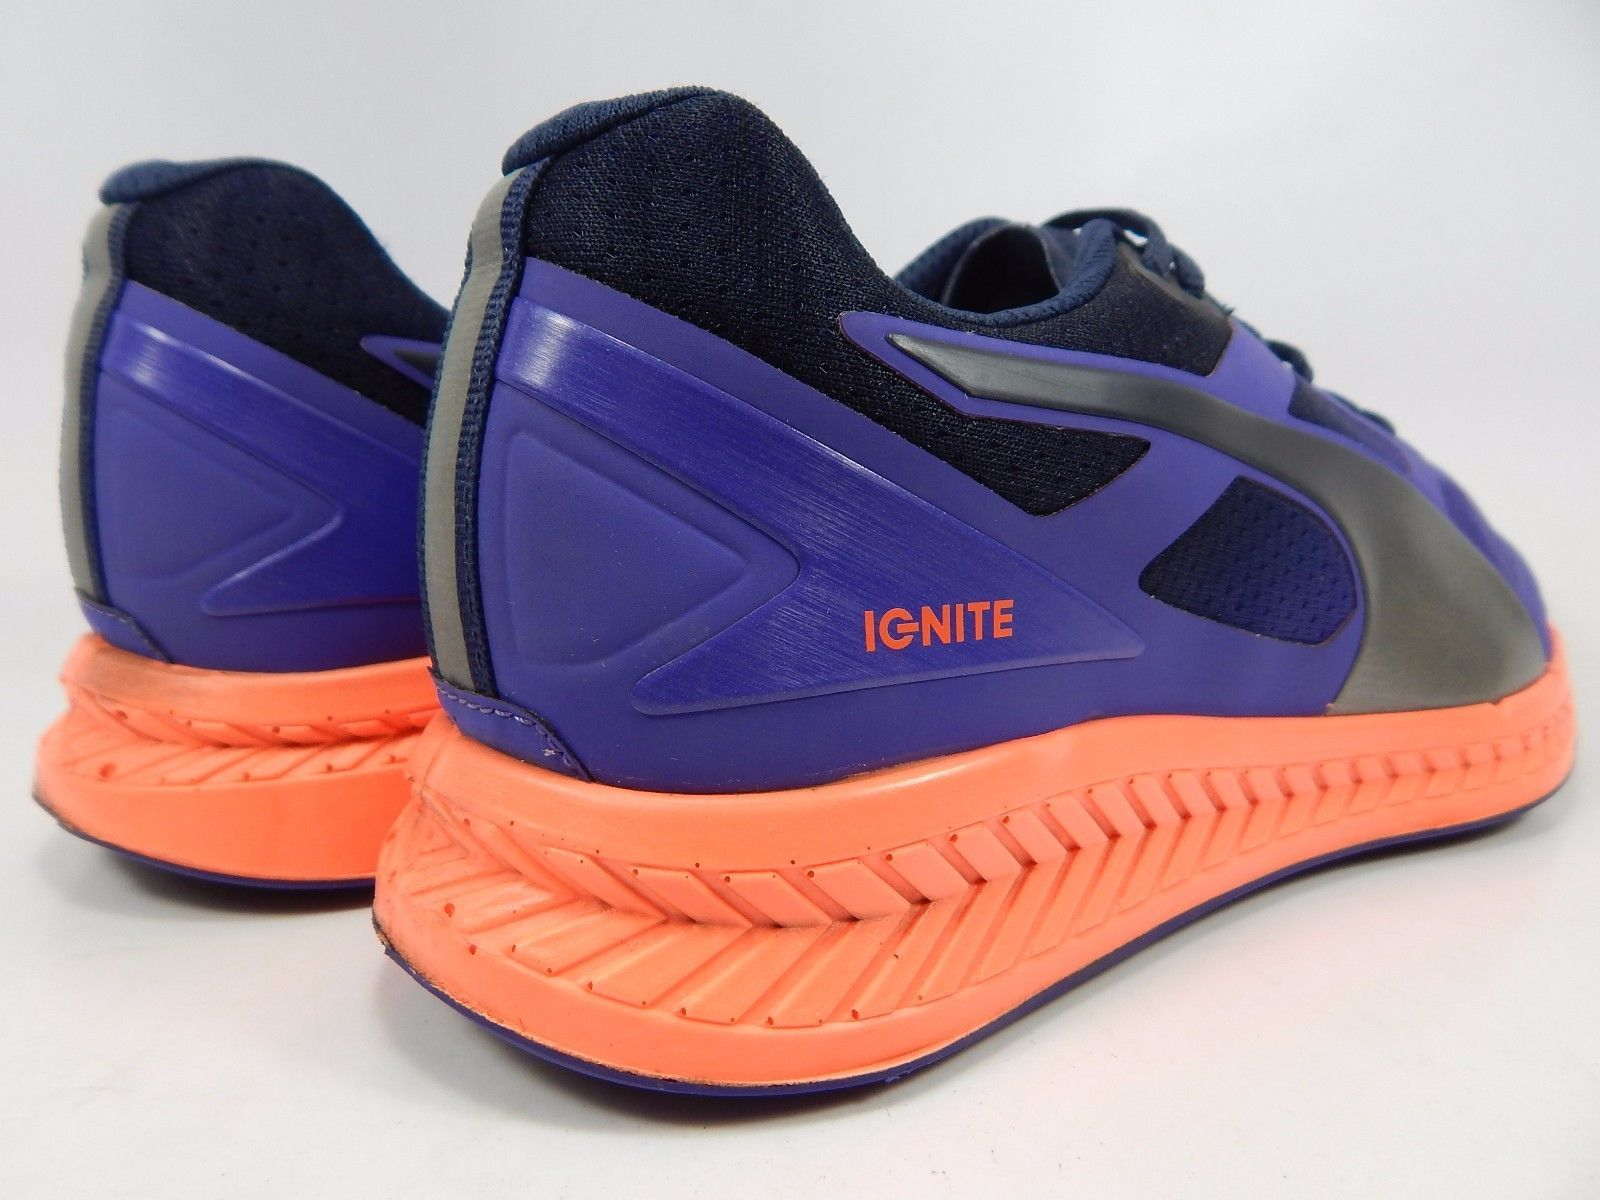 Puma Ignite Women's Running Shoes Size US 10 M (B) EU 41 Purple Orange